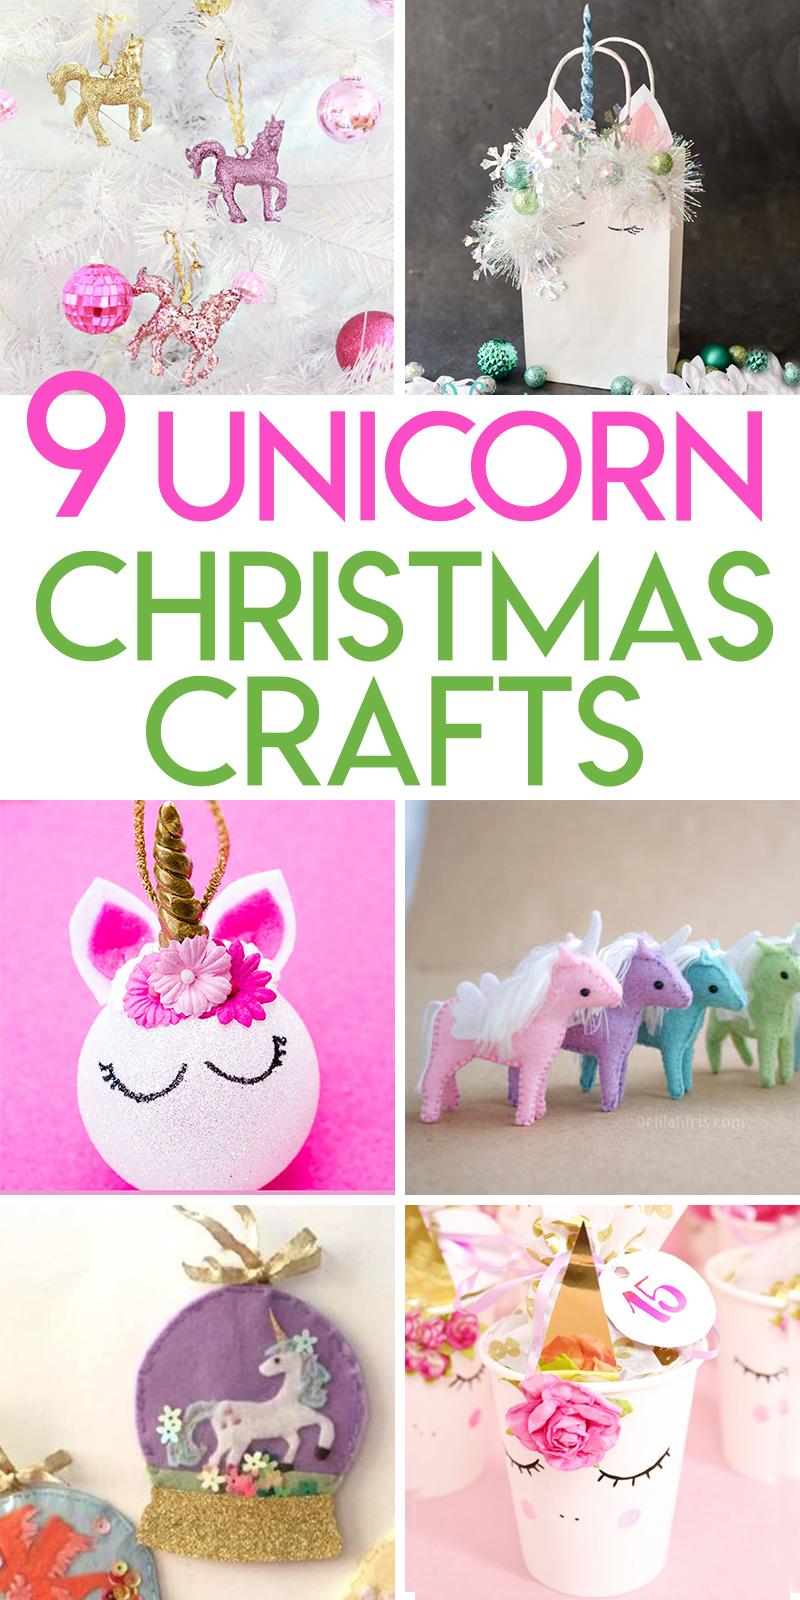 9 Unicorn Christmas crafts to DIY this holiday season